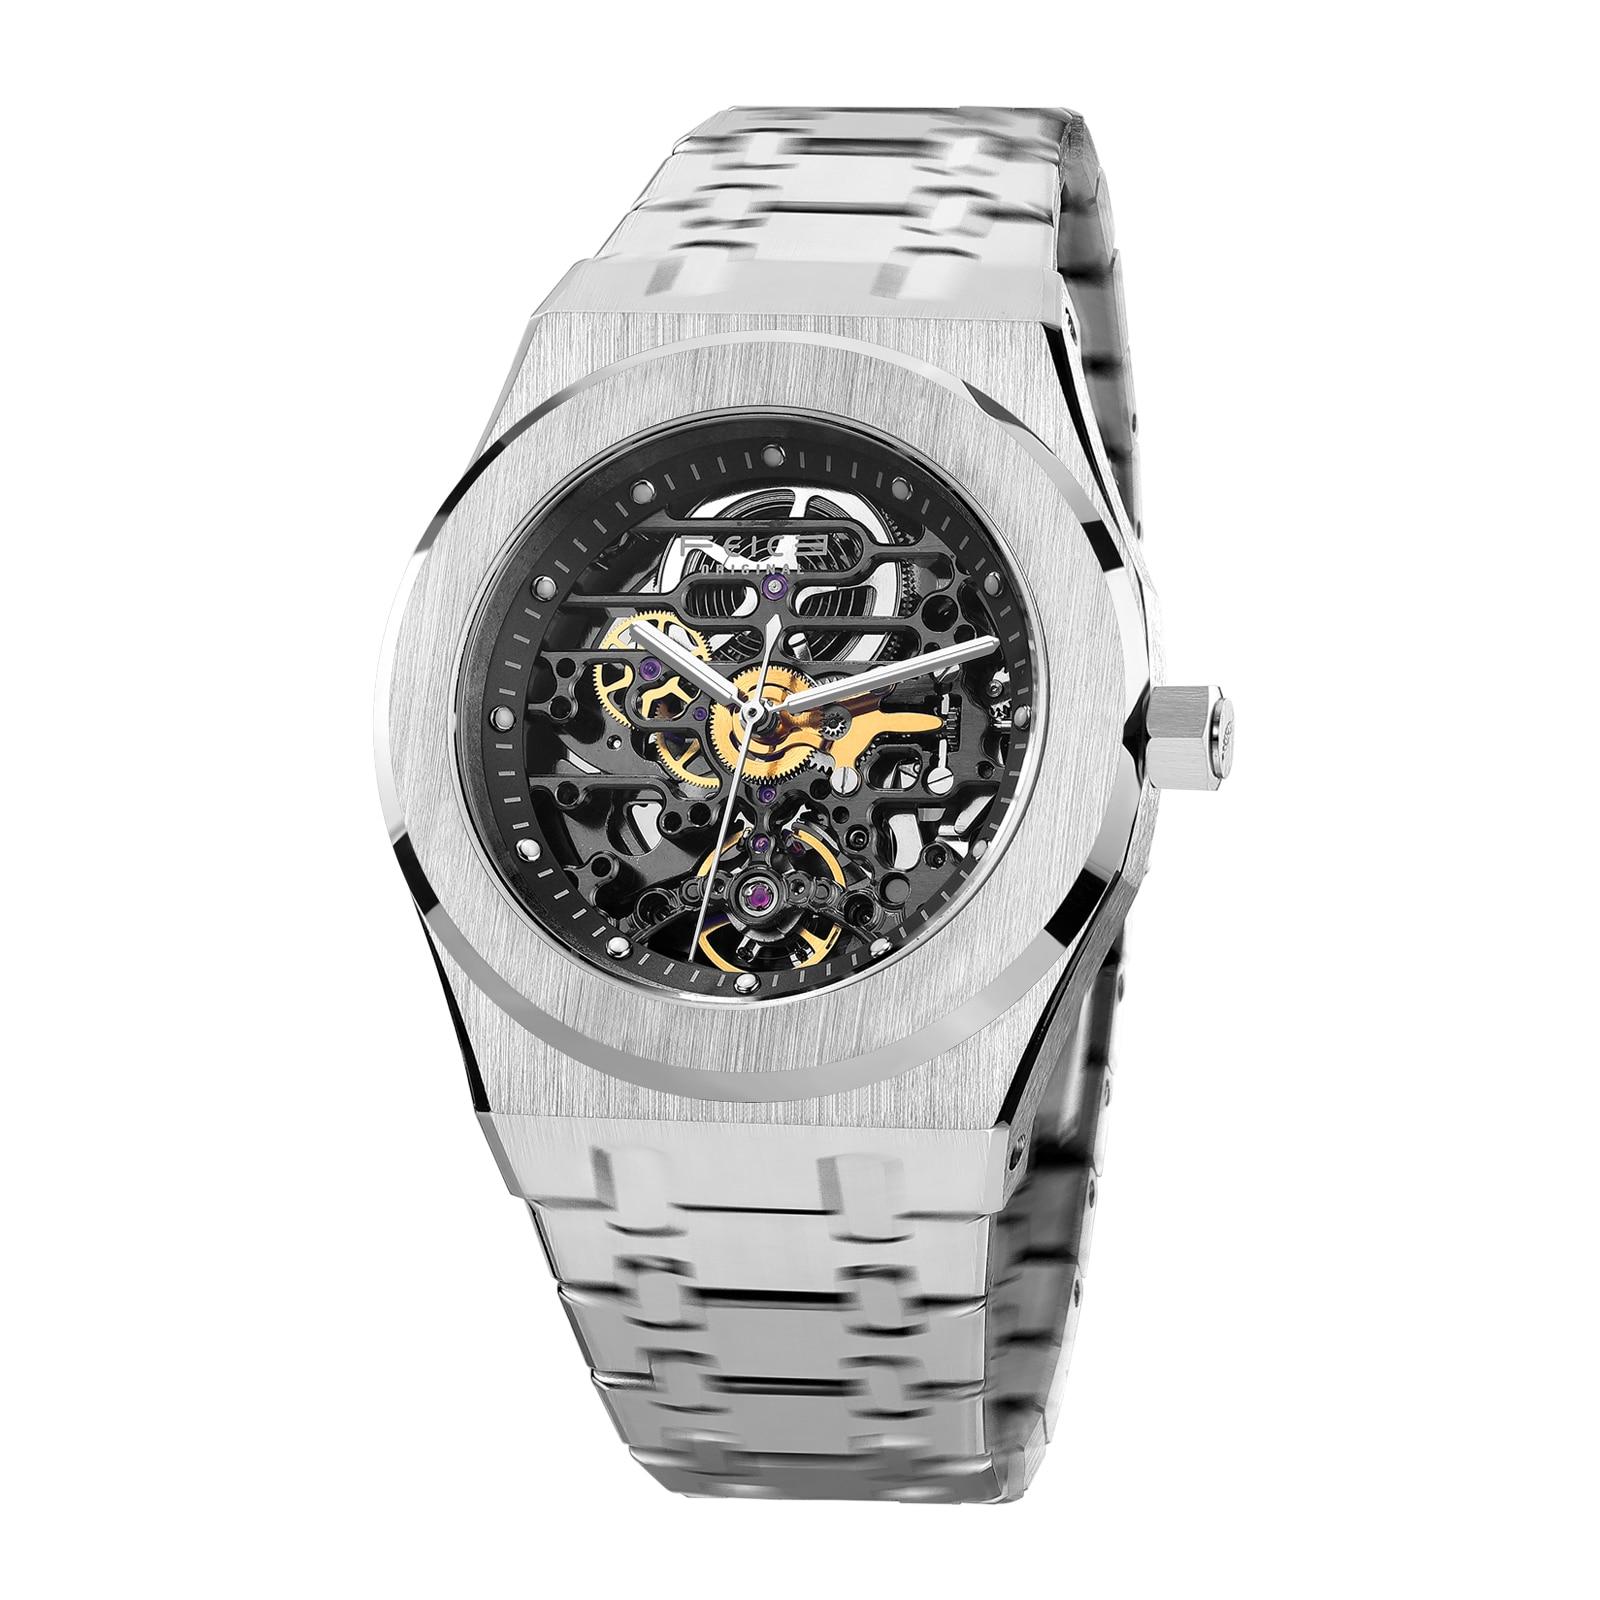 FEICE Sports Automatic Watch Men's Skeleton Mechanical Watch Waterproof Openwork Sapphire Crystal Wrist Watches for Men FM019HOT